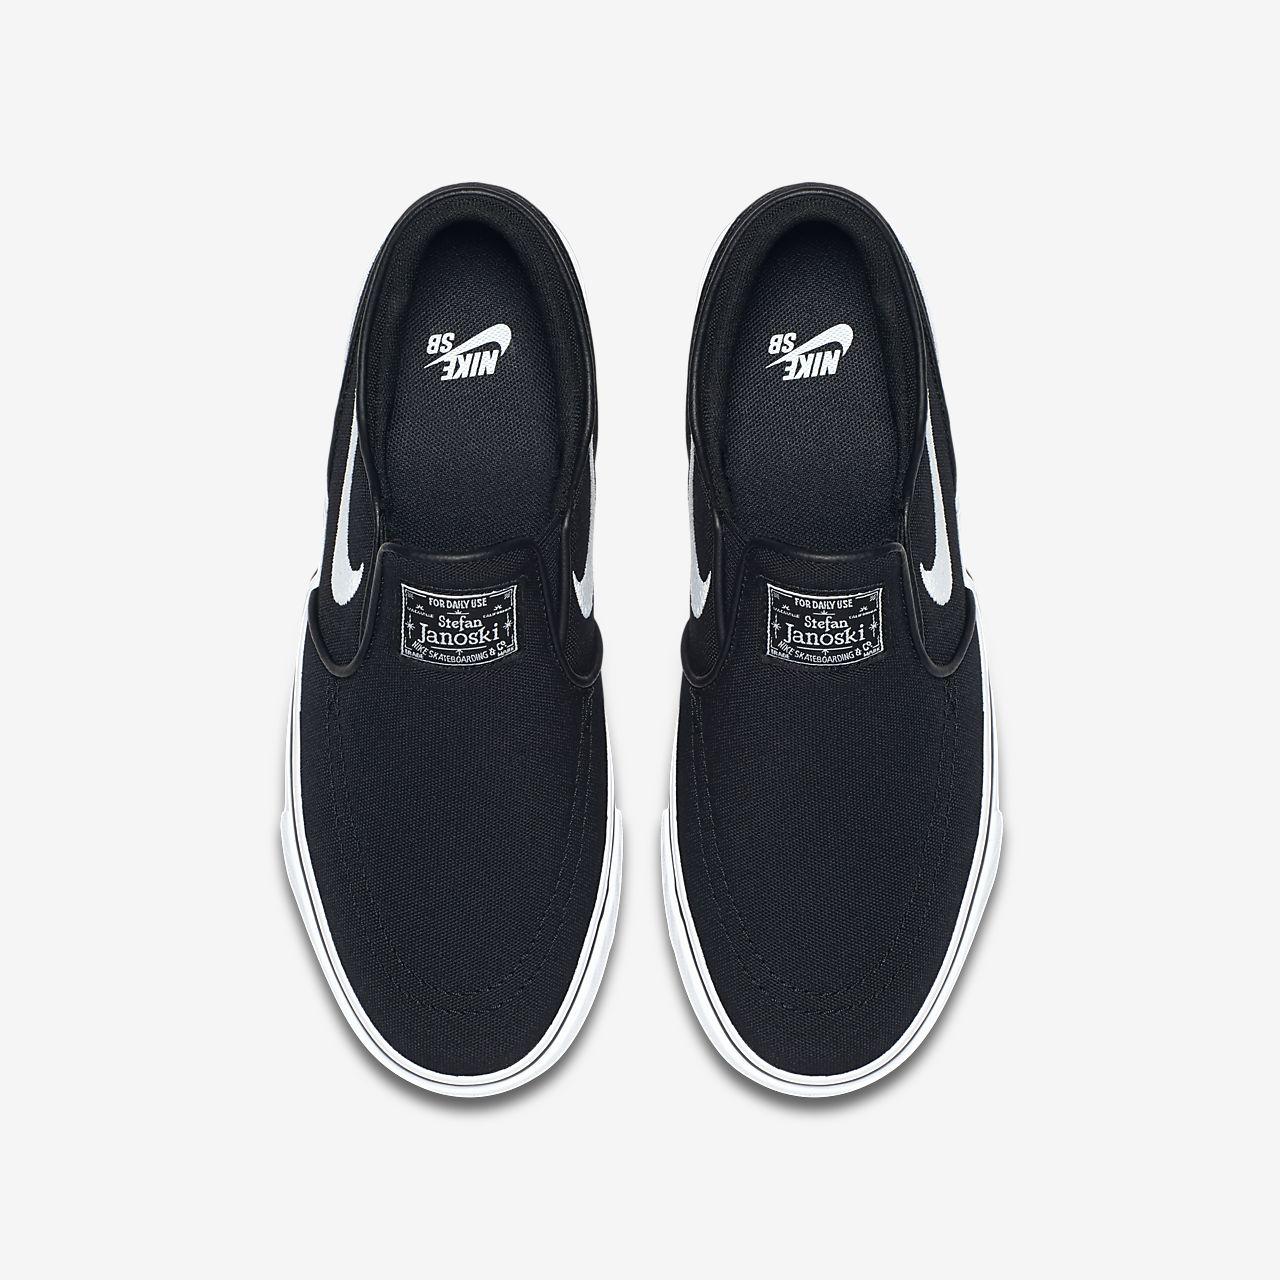 7d0fd45f3f5c Nike SB Stefan Janoski Canvas Slip-on Big Kids  Skateboarding Shoe ...